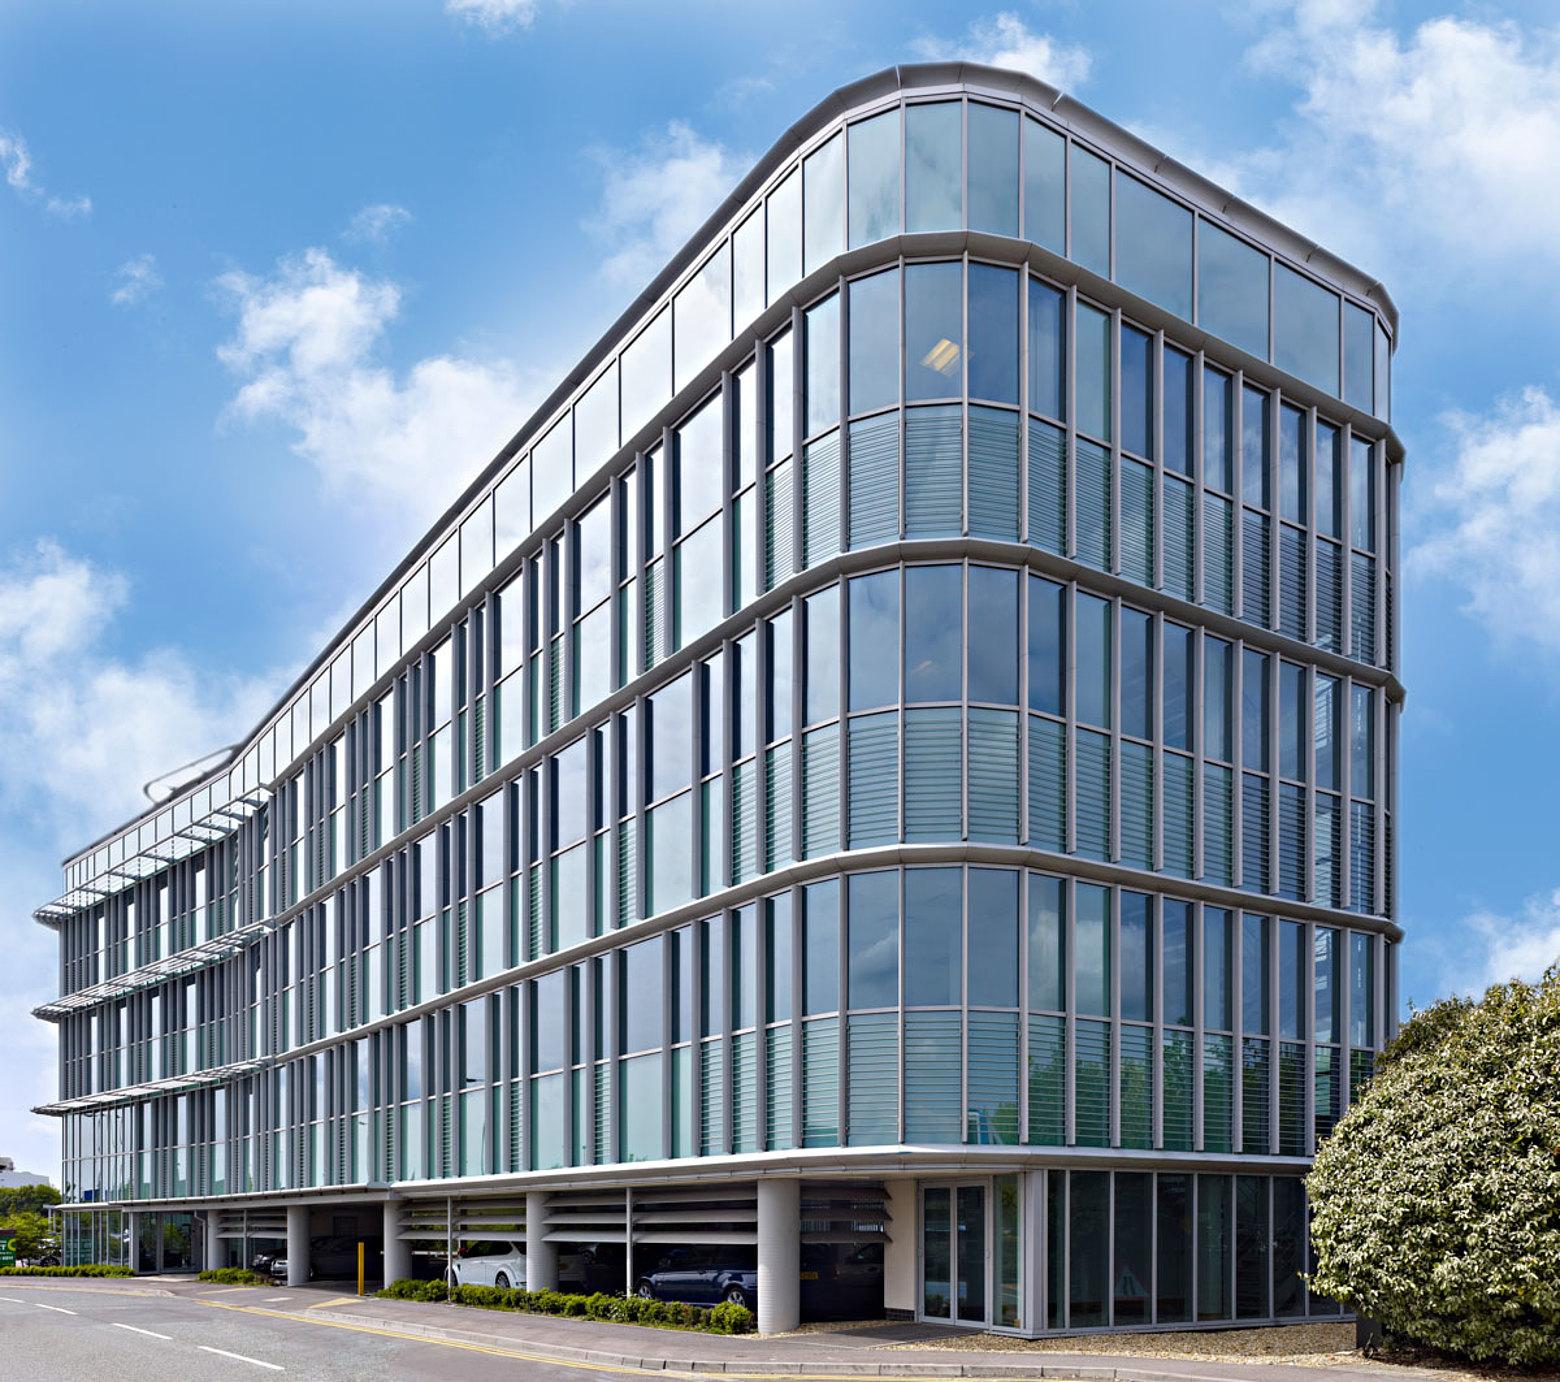 Wärmegedämmte Pfosten-Riegel-Fassade, Brandschutz EI30, forster thermfix vario Bank HSBC, GB-Southampton